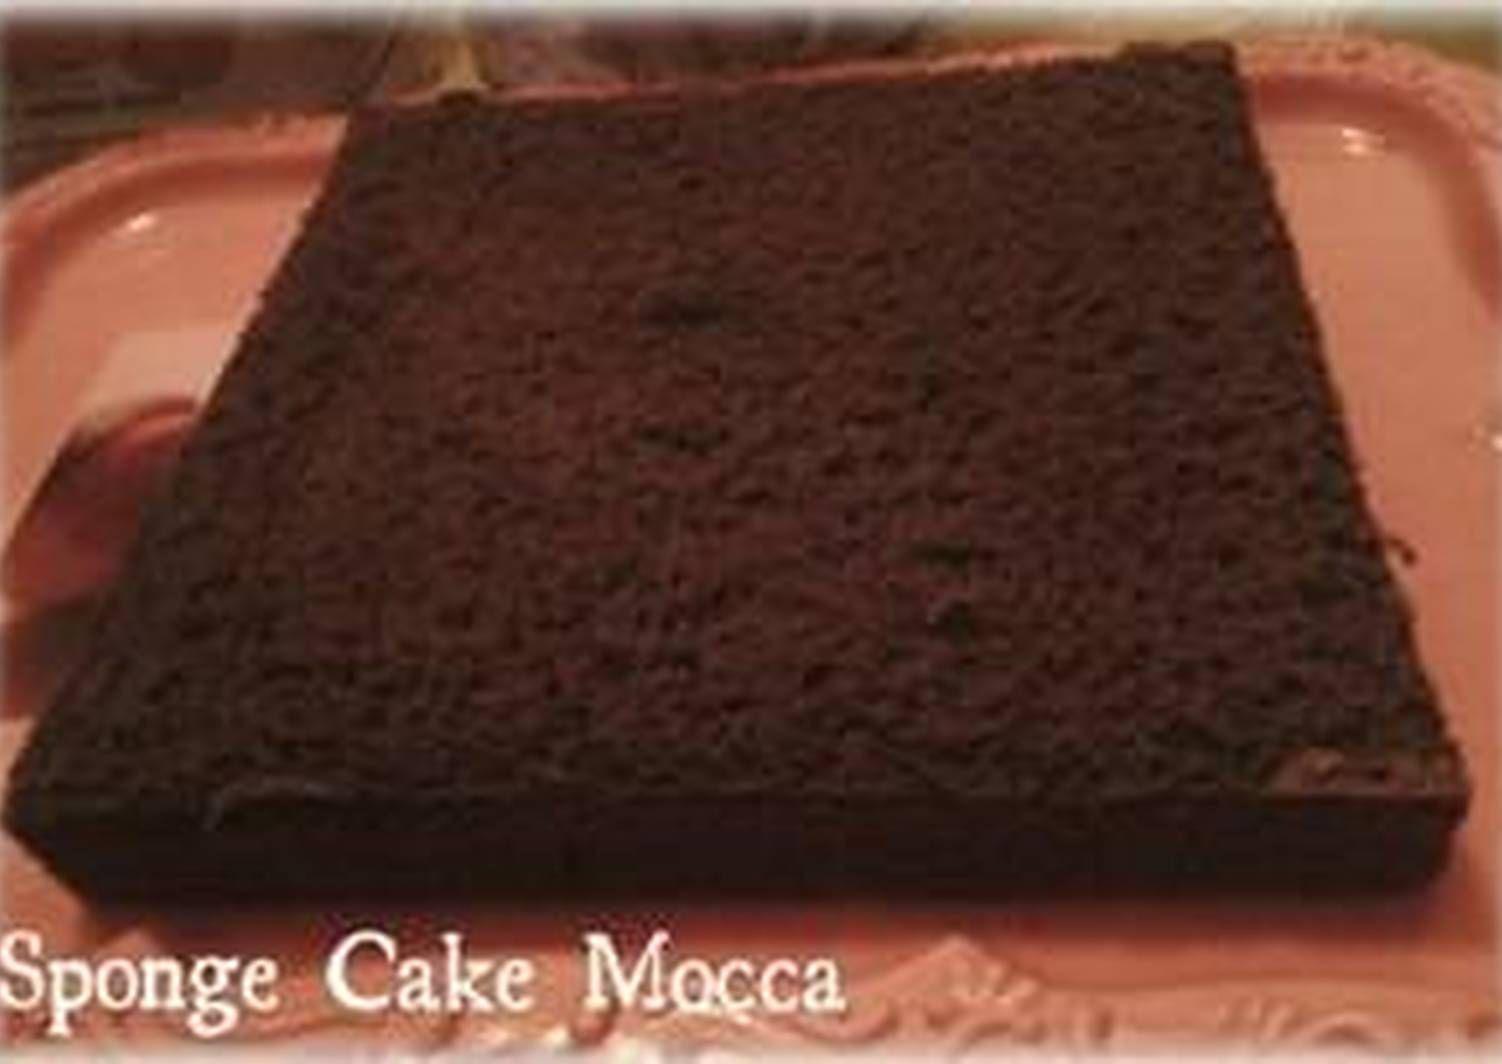 Resep Sponge Cake Mocca Ala Om Yongki Gunawan Oleh Aidi Styleshop Resep Resep Kue Bolu Kue Lapis